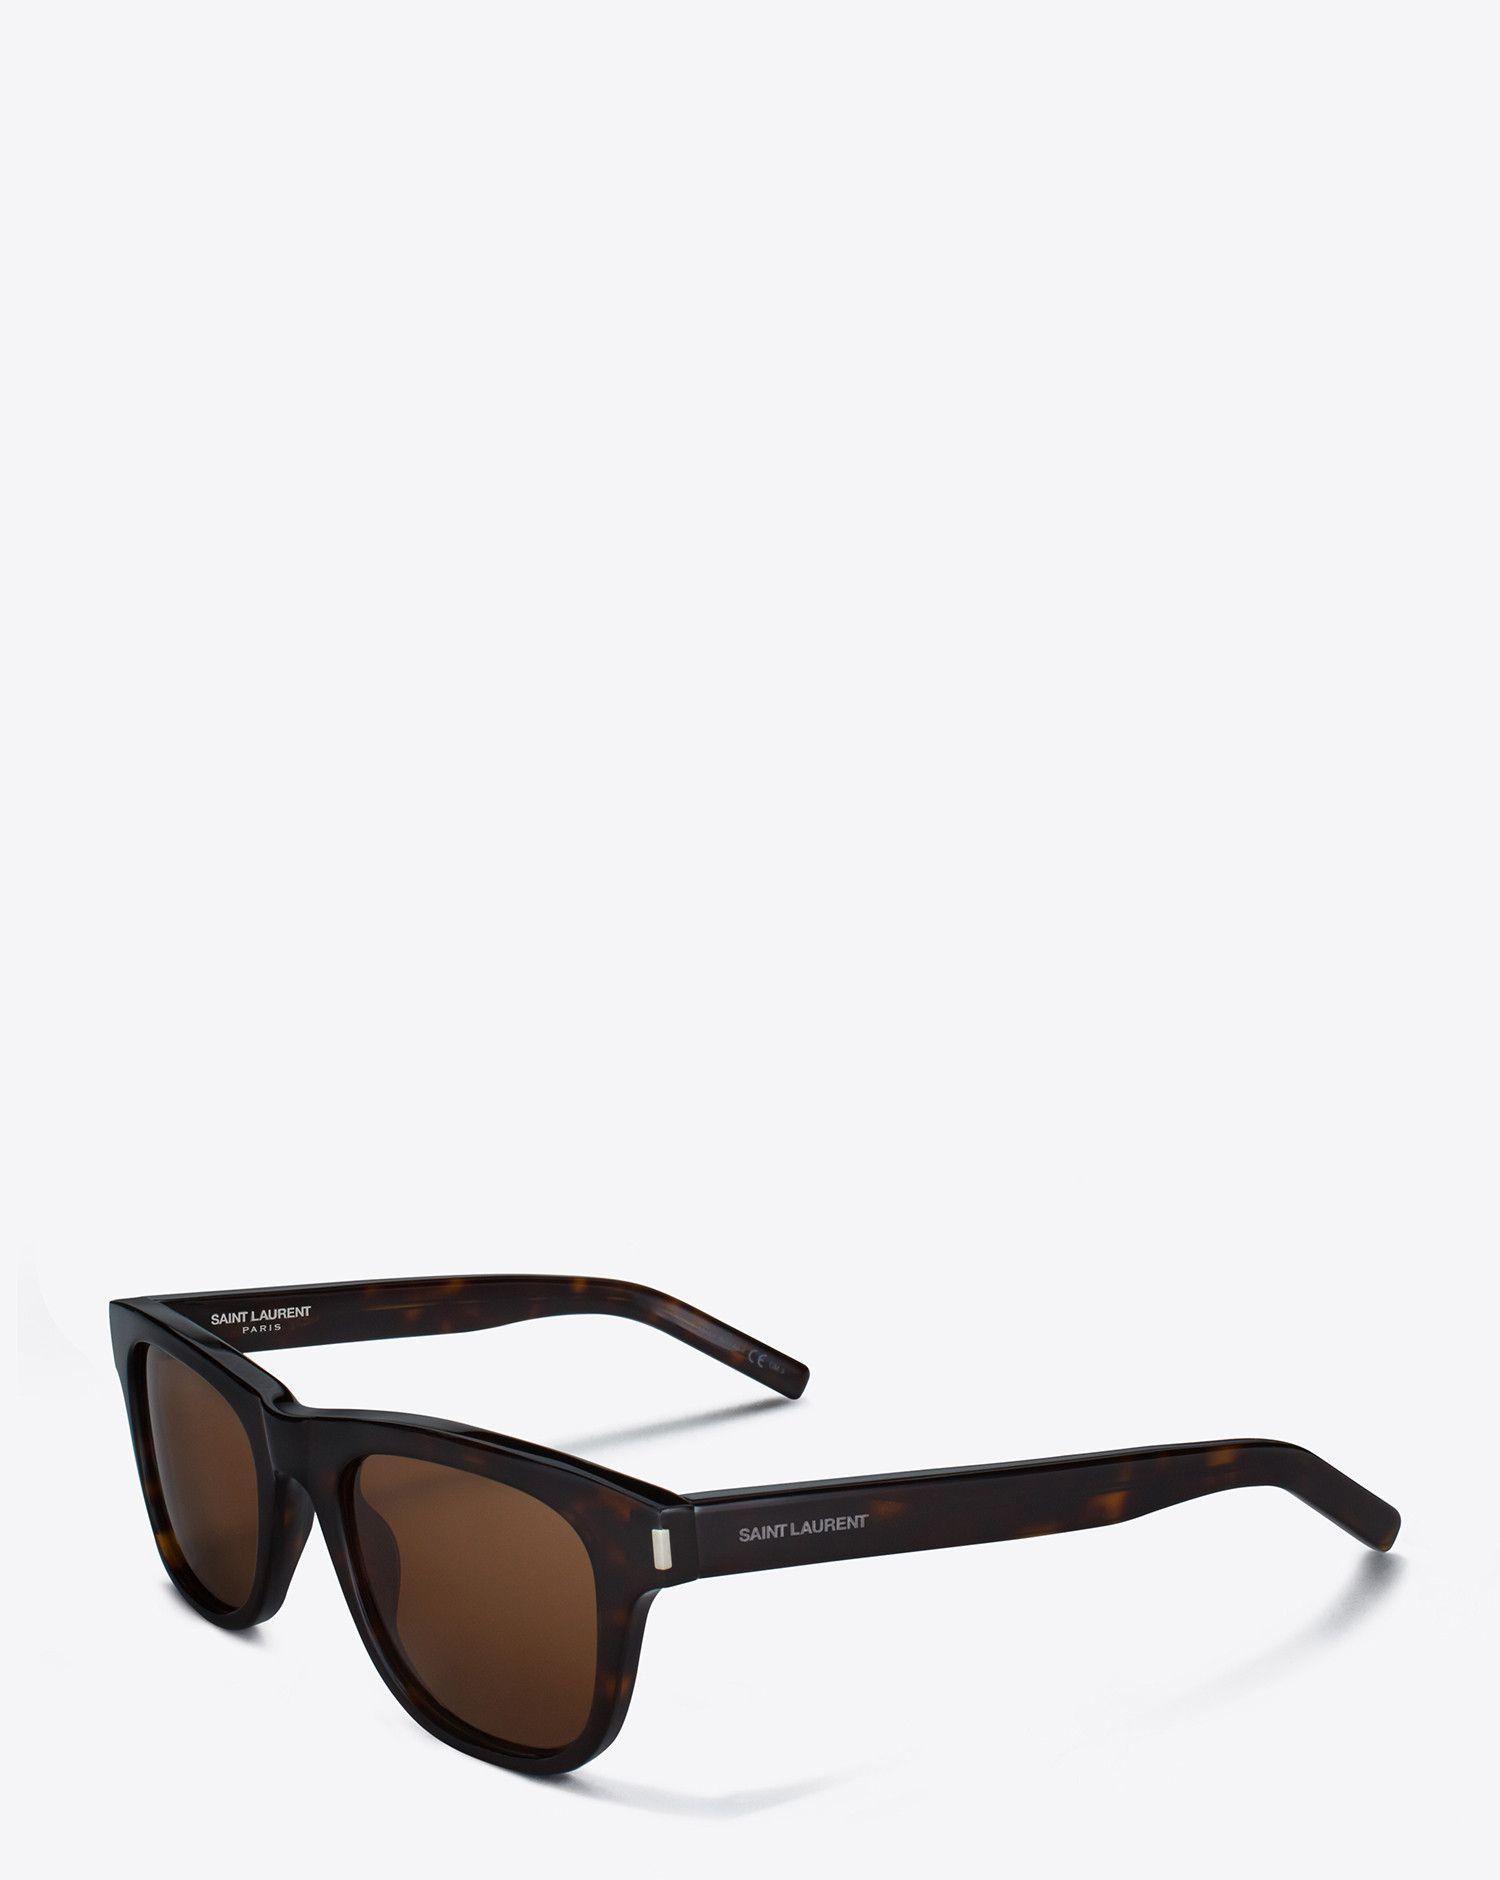 a21d1a1dc8cdf Saint Laurent Classic 2 Sunglasses In Dark Havana Acetate With Brown Lenses